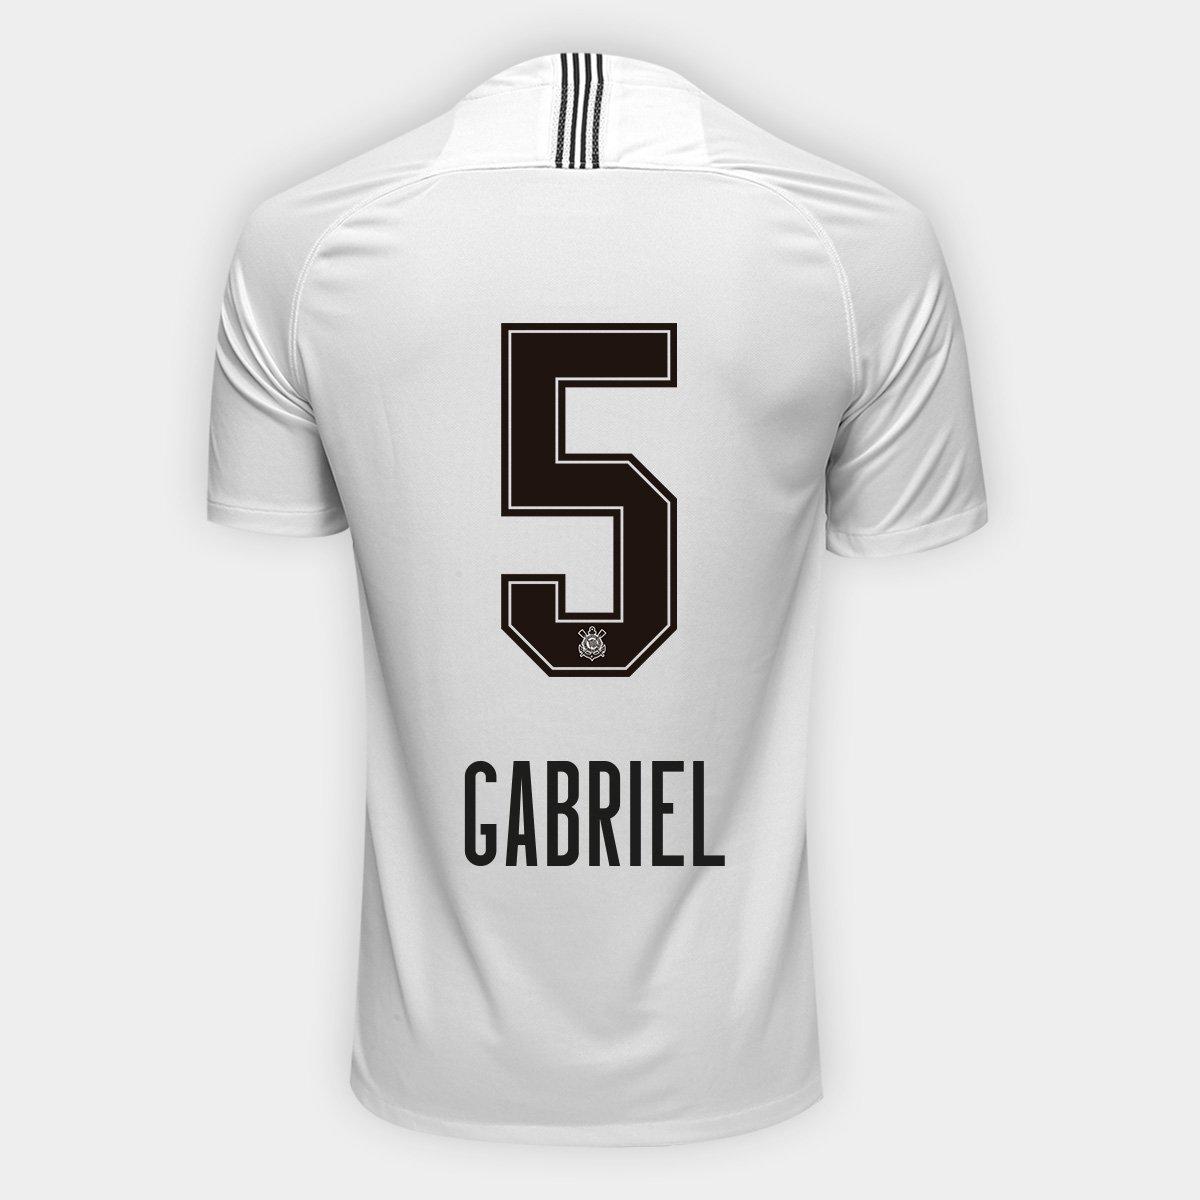 Camisa Corinthians I 18 19 Nº 5 Gabriel - Torcedor Nike Masculina ... 3d7fb4925dded